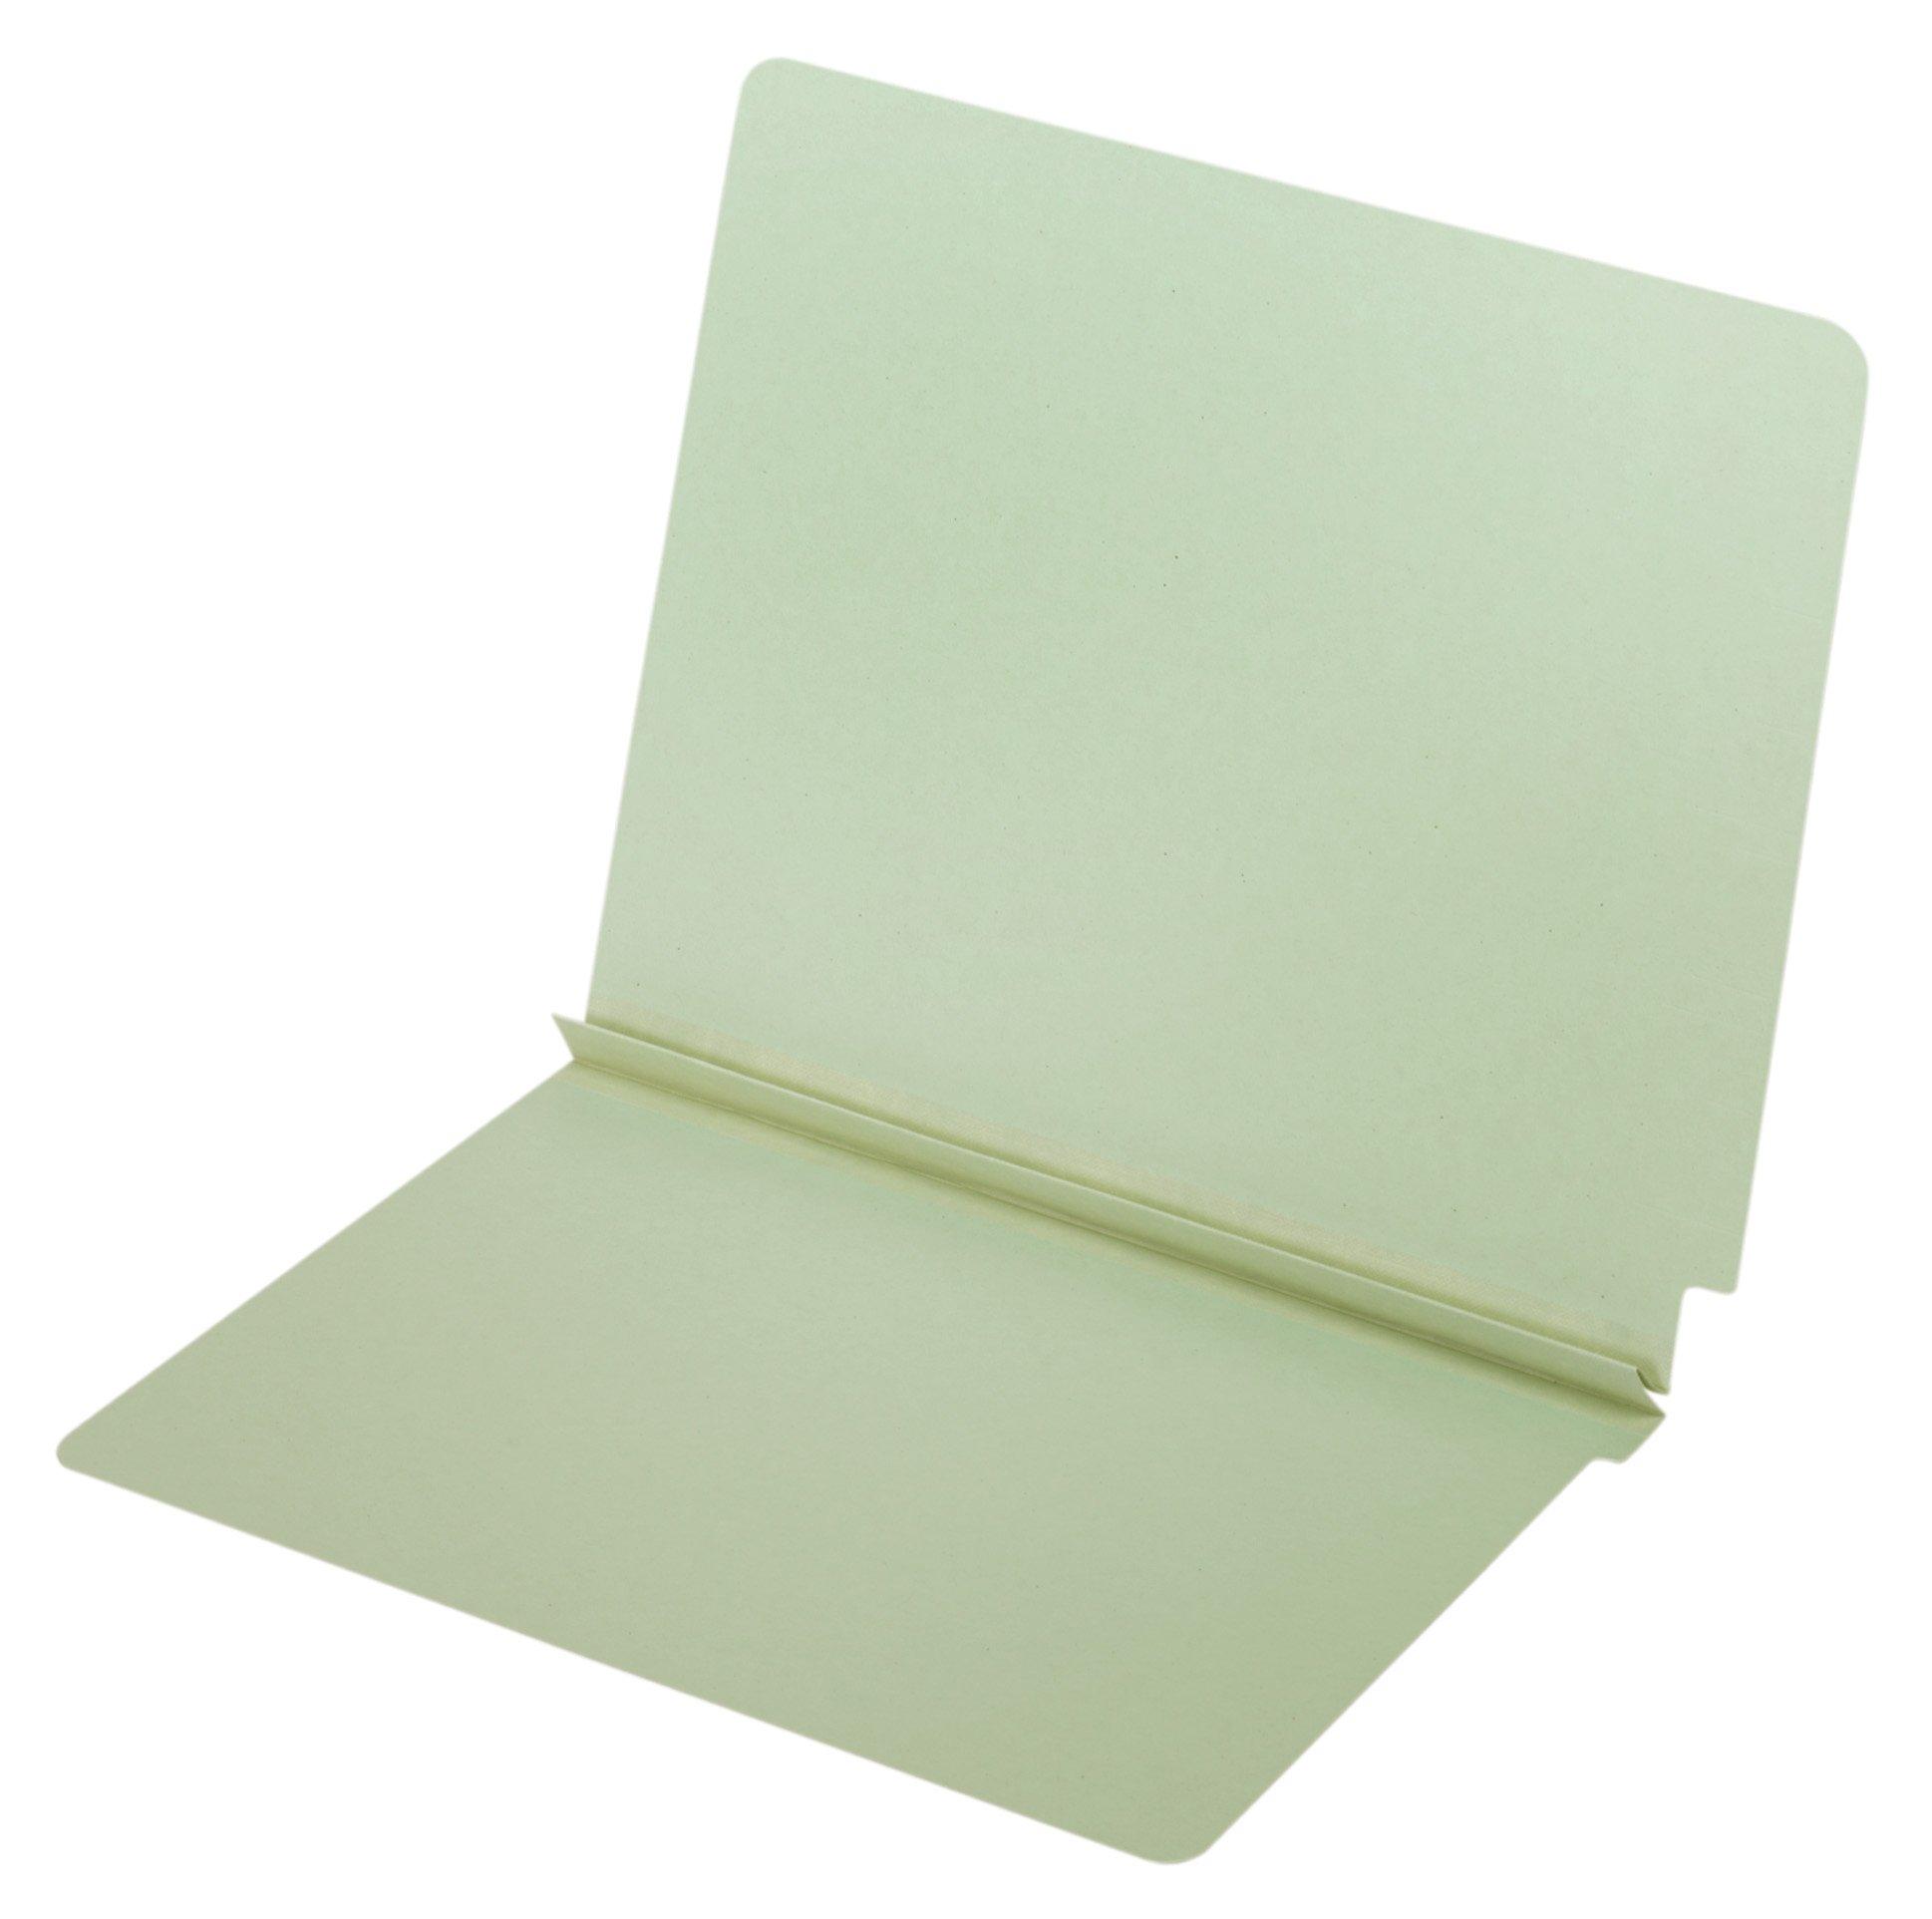 Globe-Weis/Pendaflex End Tab Pressboard Folder, 2-Inch Expansion, Letter Size, Light Green, 25 Folders Per Box (36210GW)